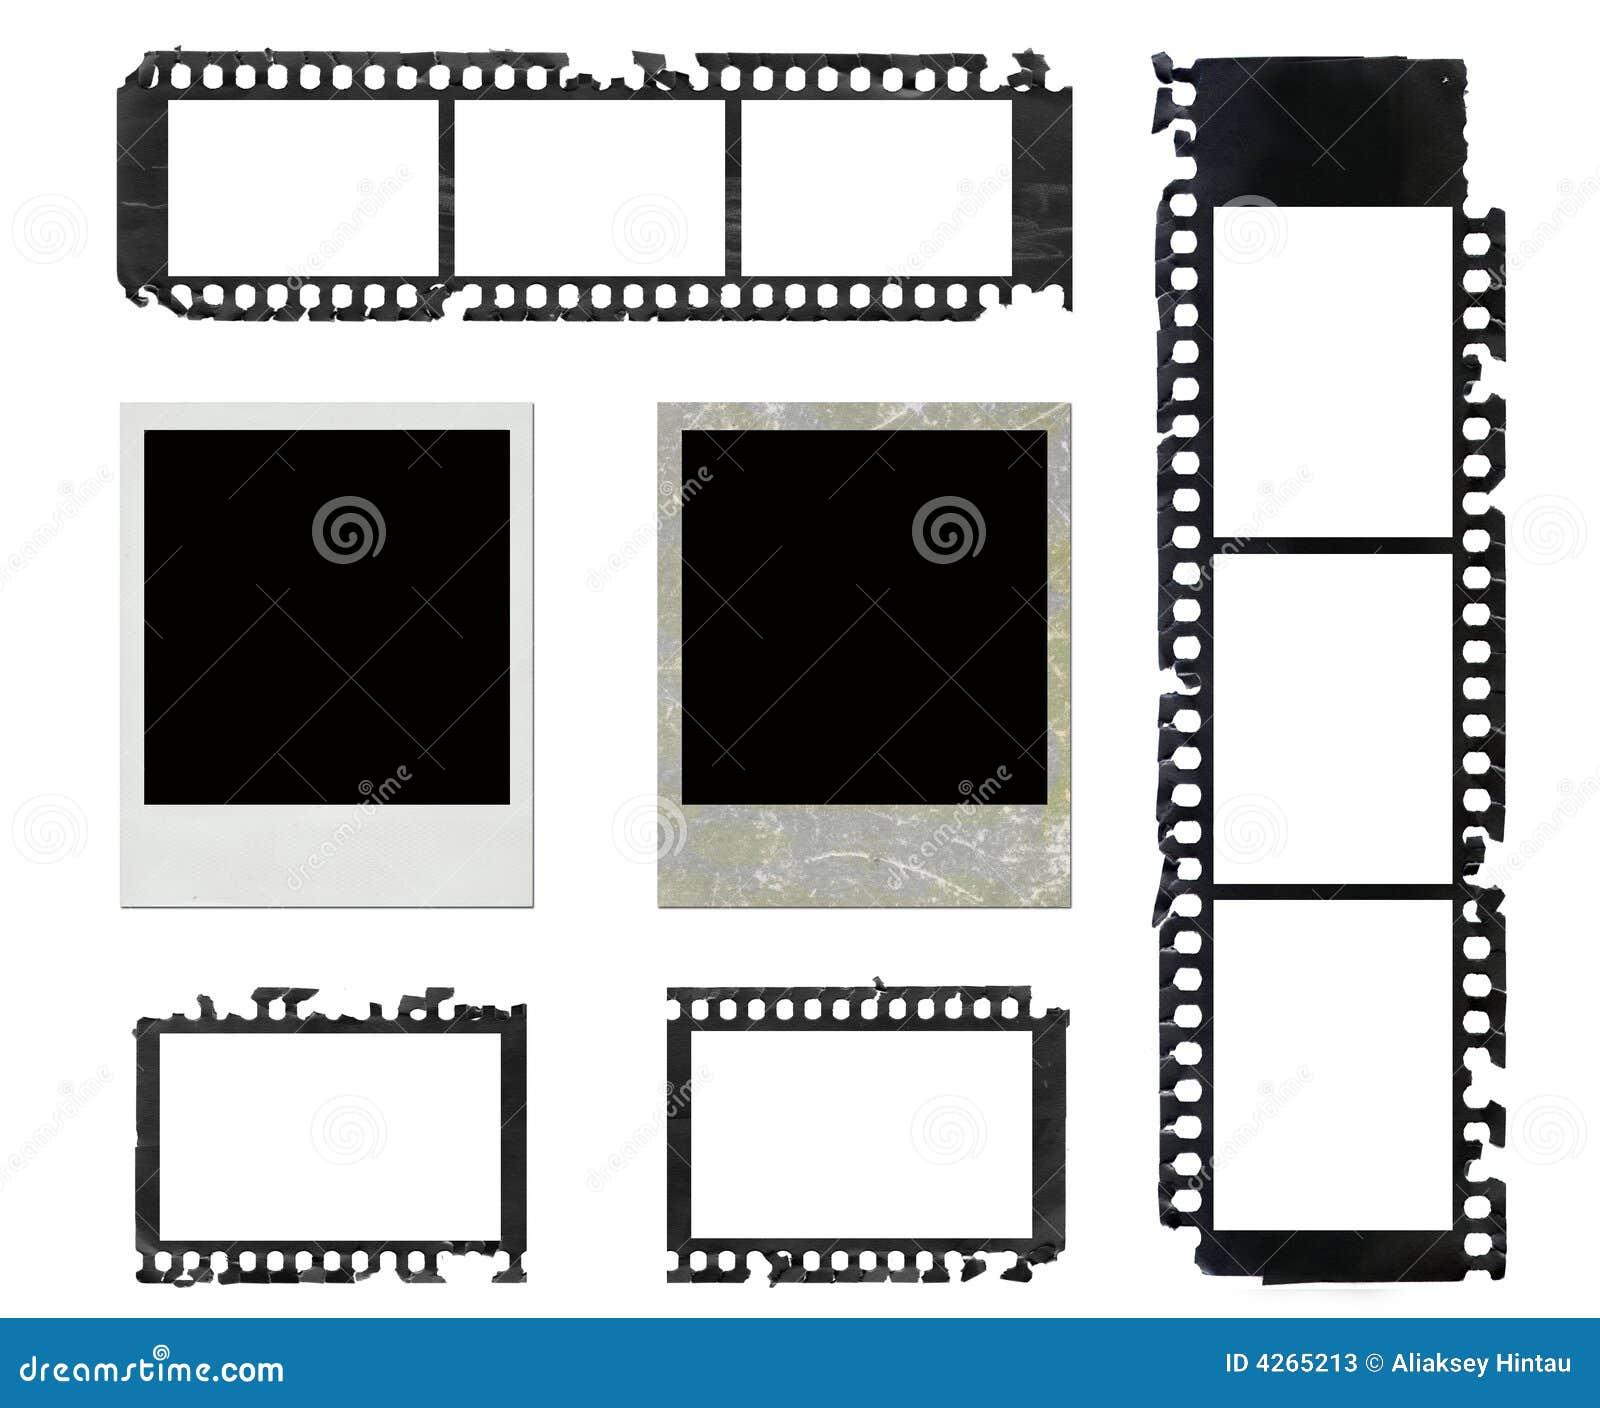 Polaroid frames and grunge negative film set